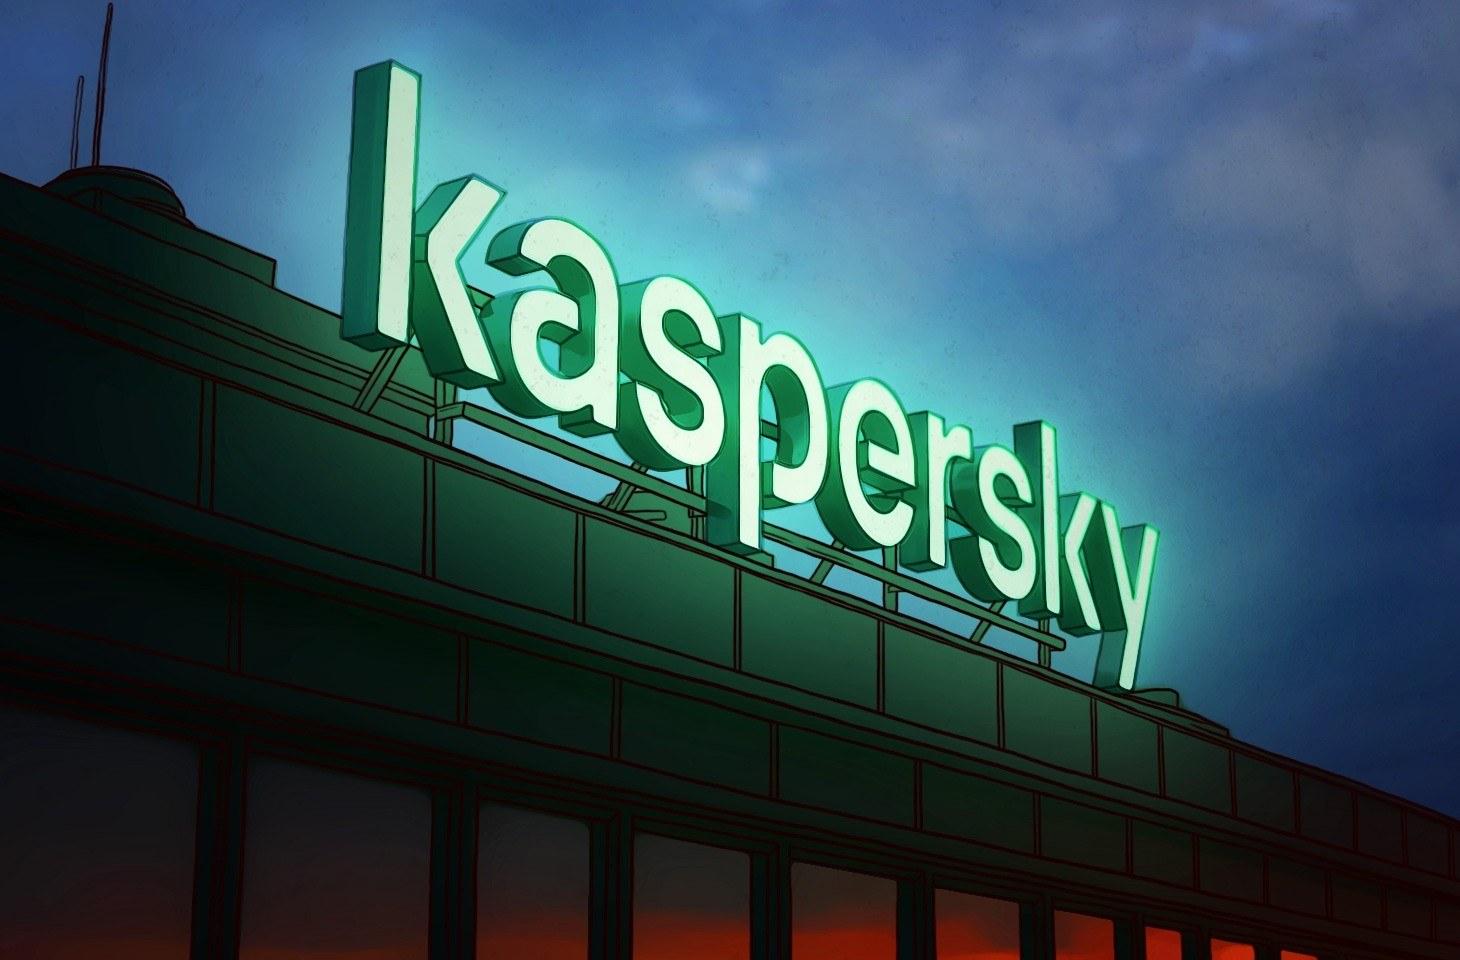 Kasperskyファンクラブ、13周年